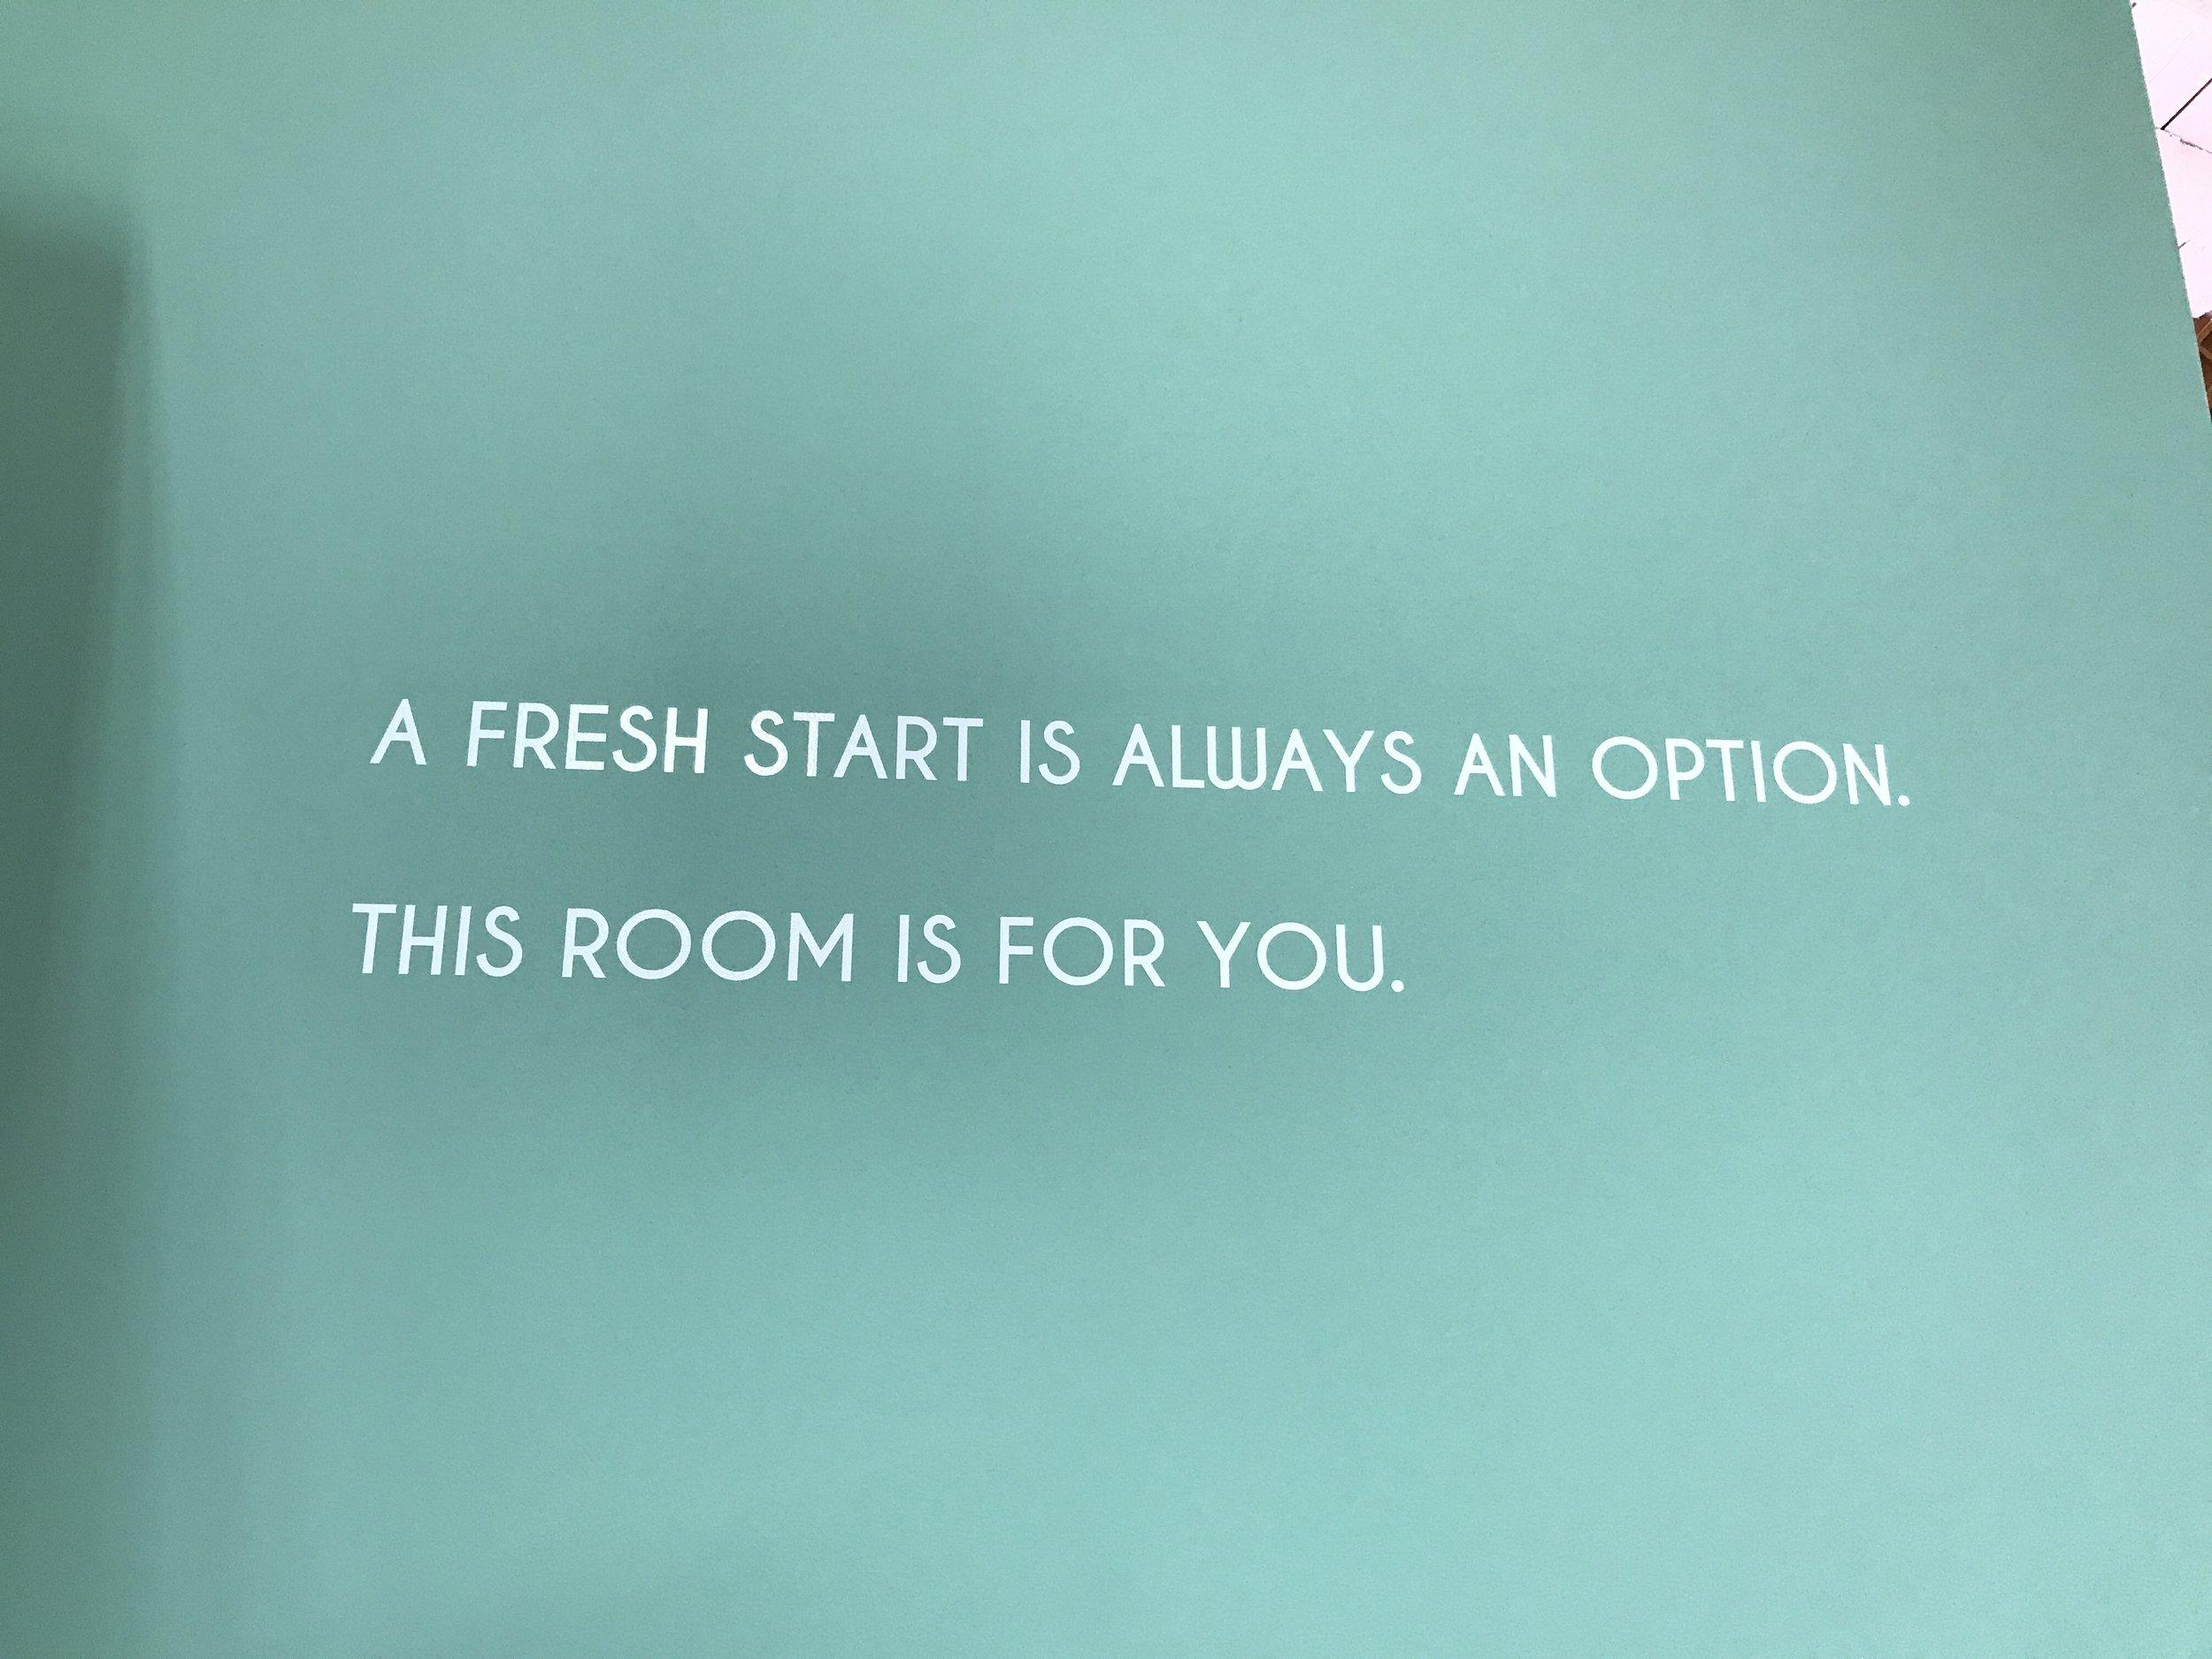 Mint Chip Life - Museum of Ice Cream Room Quote